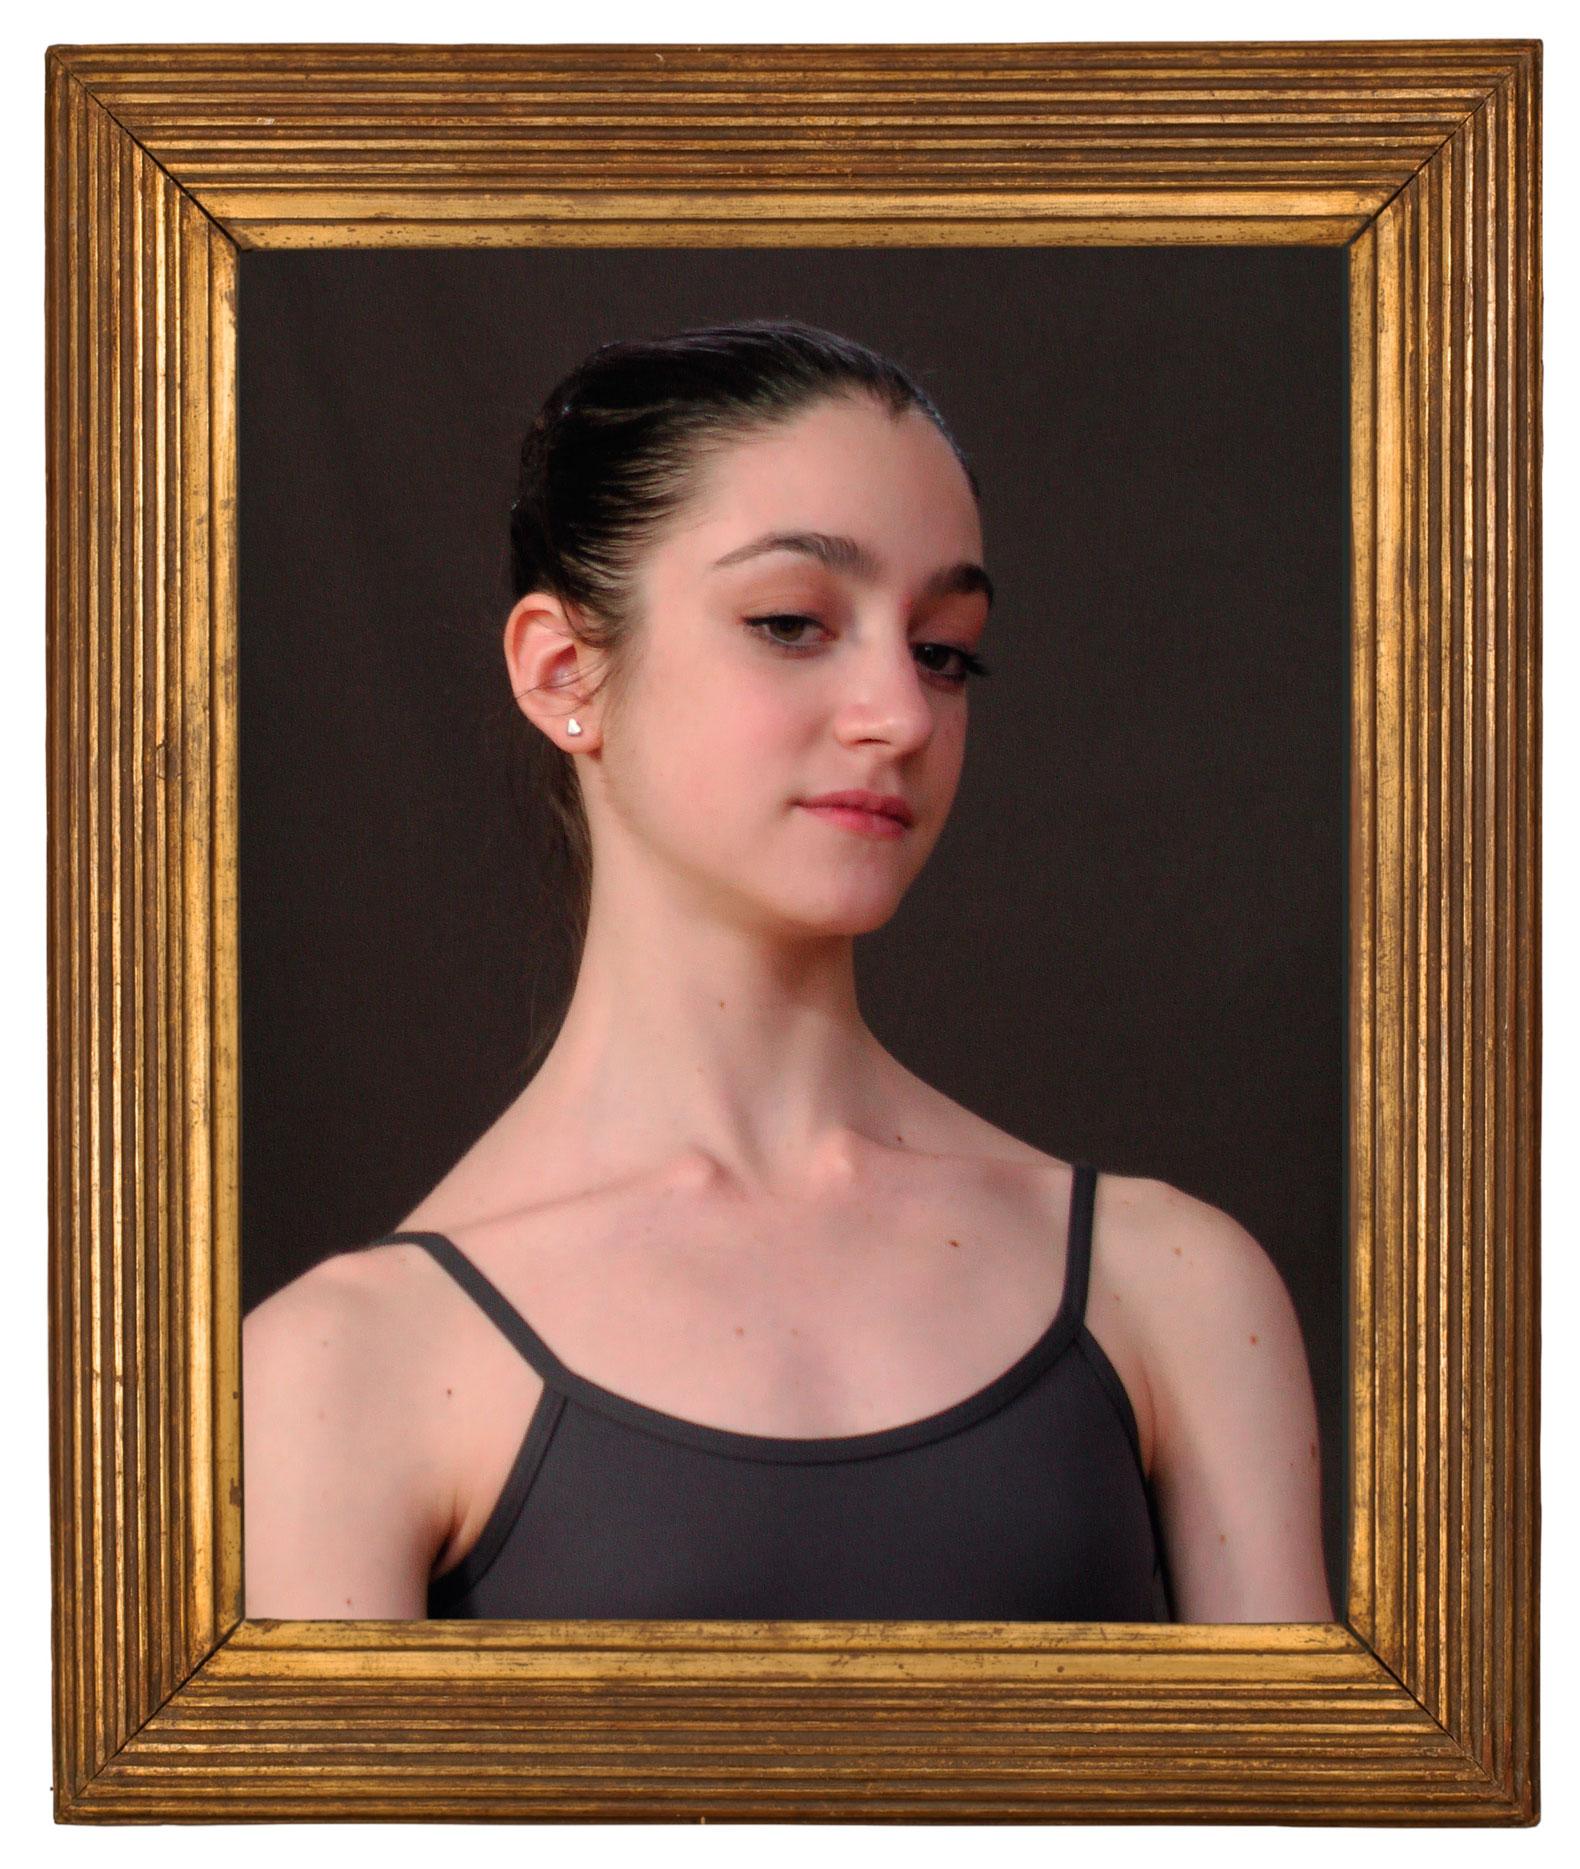 Portrait of Allessia (with frame), 2018 © Gabriella Gerosa, courtesy Ivorypress